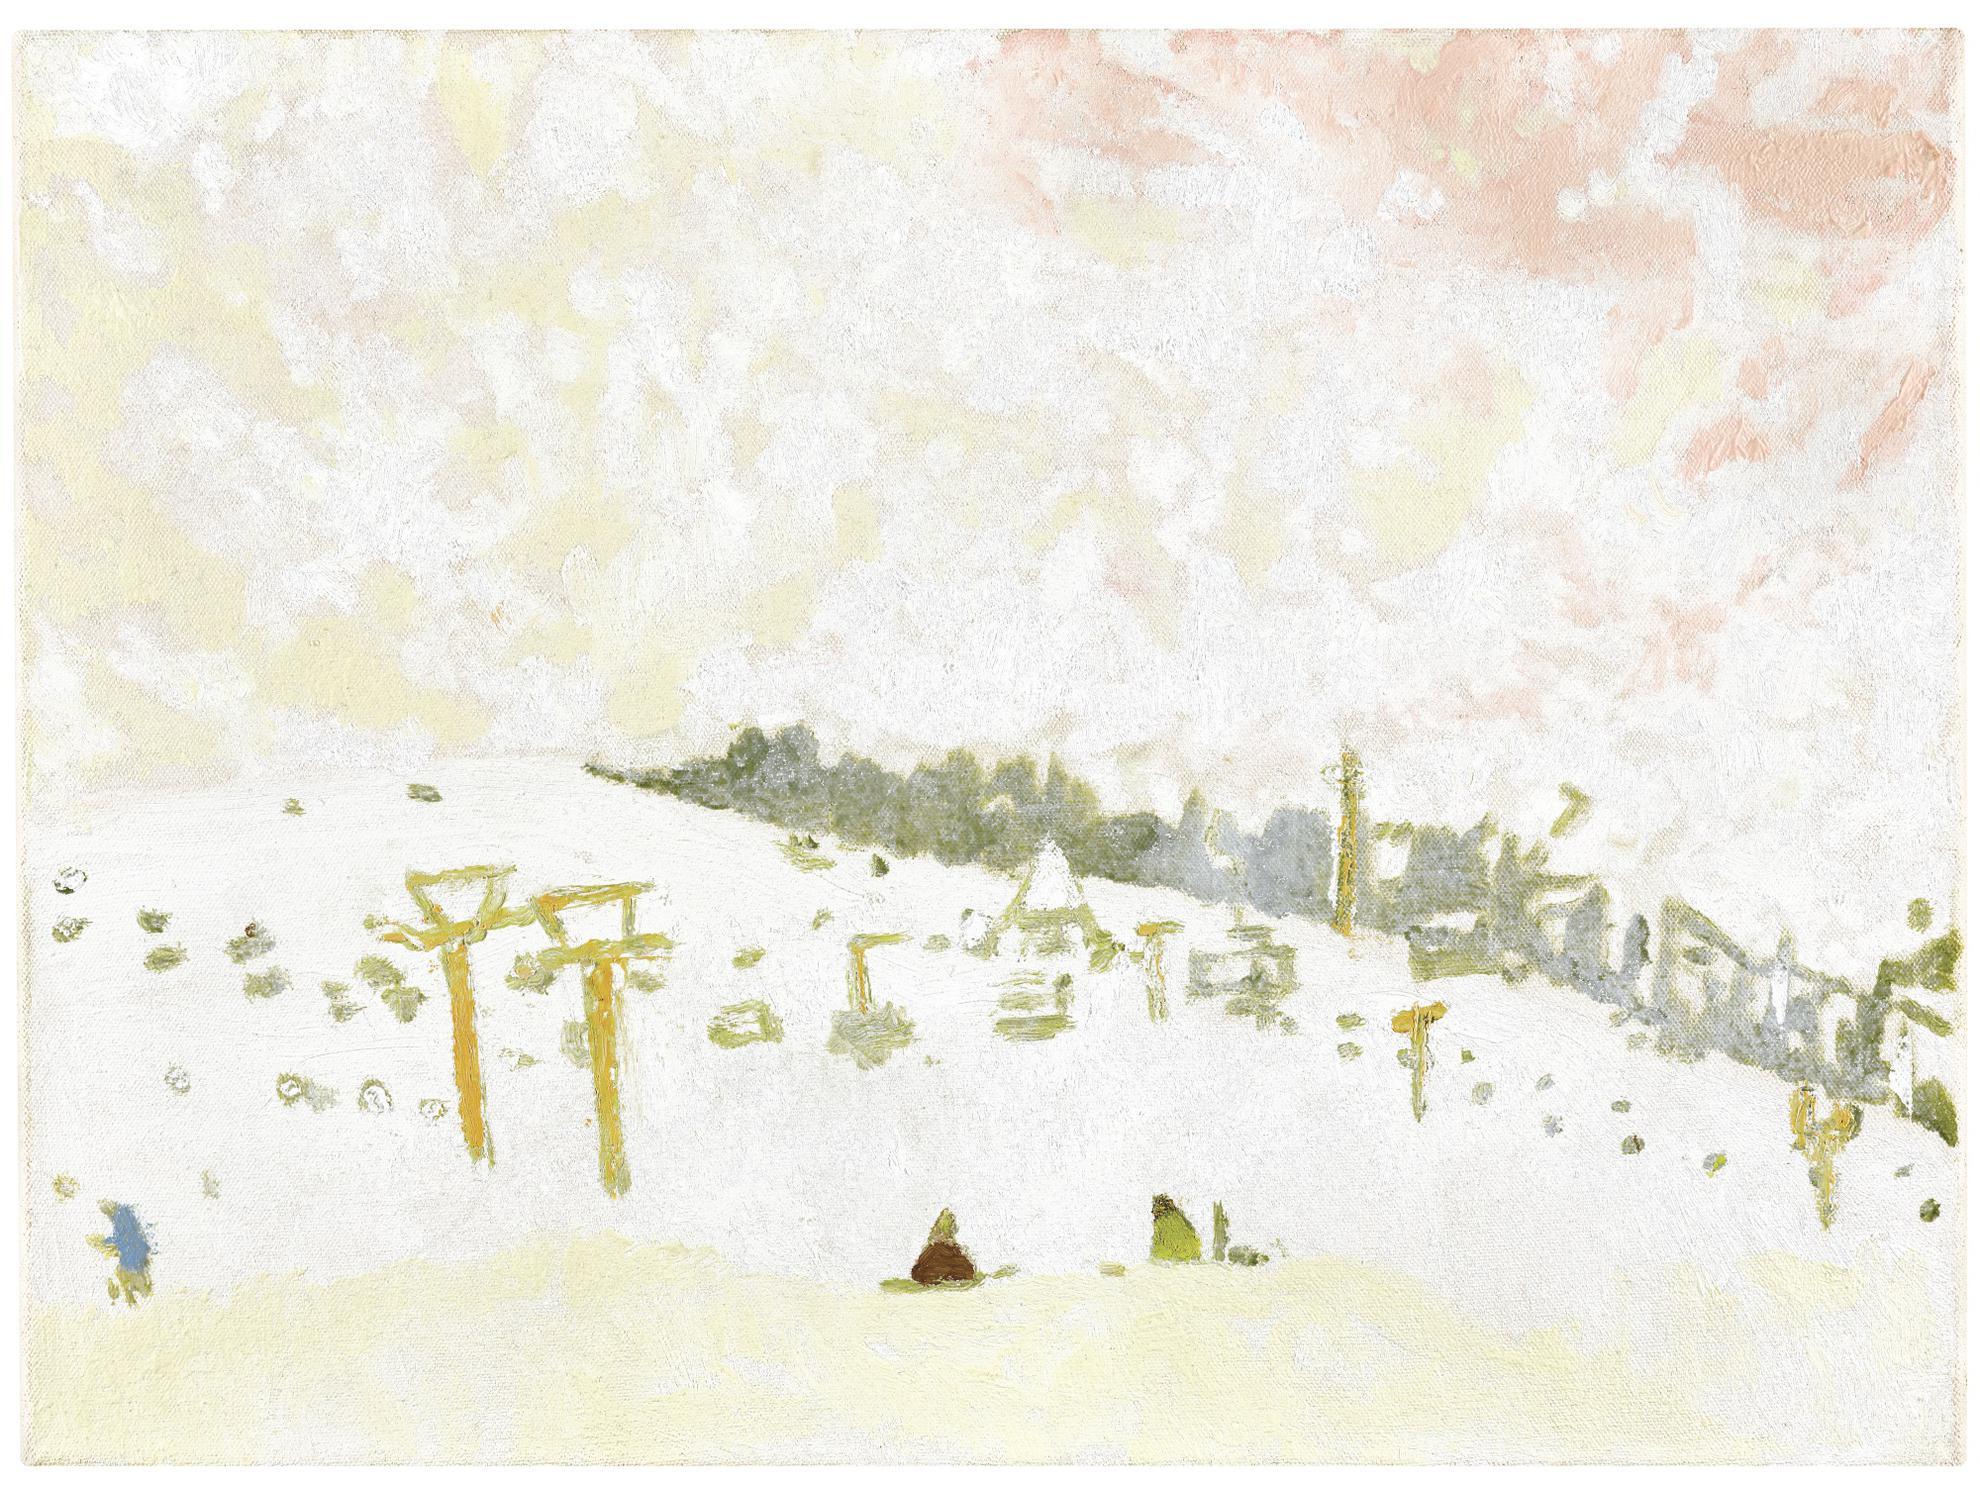 Peter Doig-Pink Snow-1996